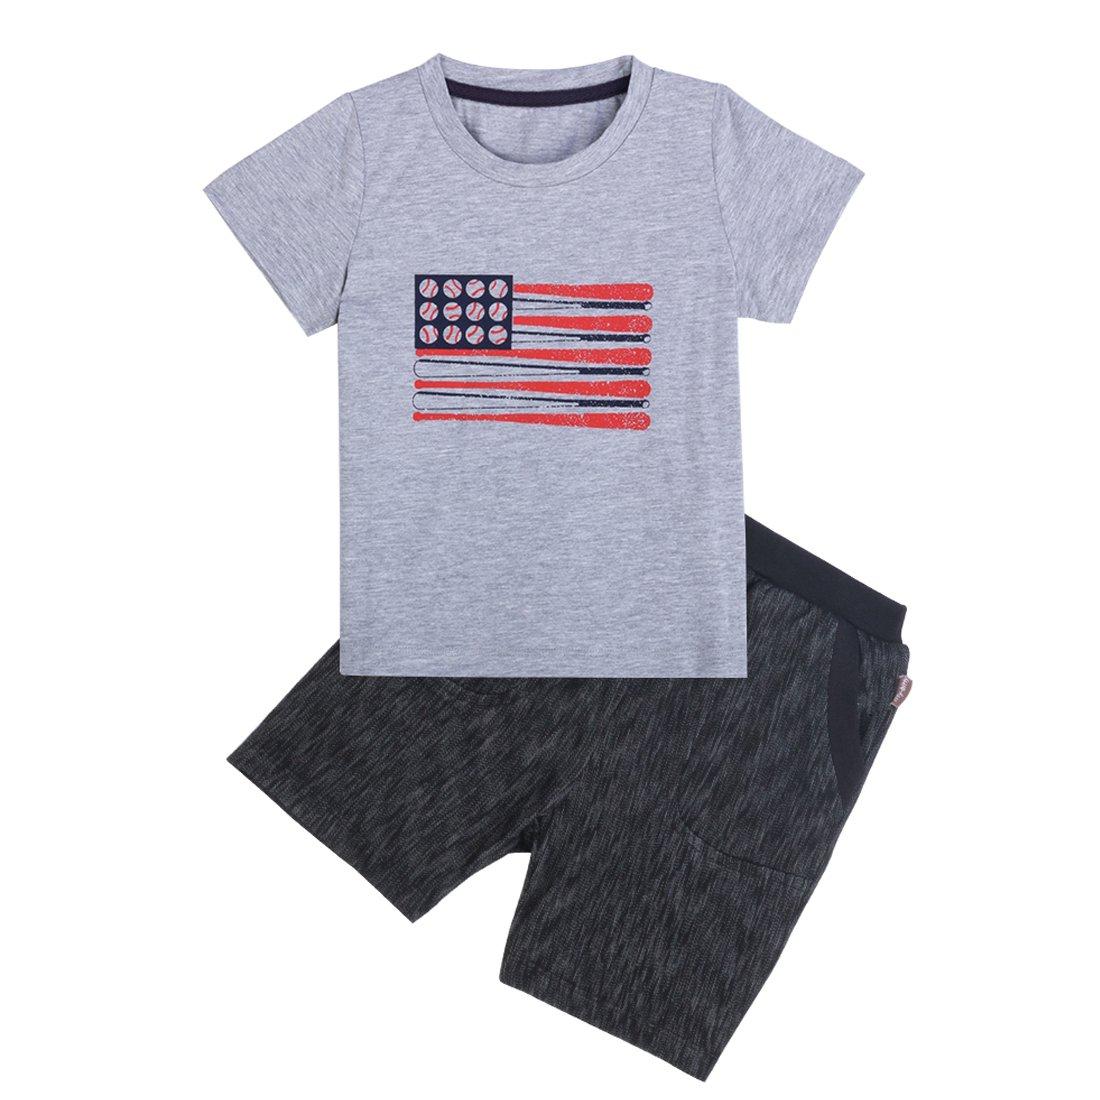 Little Boys Clothing Sets 2pcs Cotton T-Shirt and Jeans Shorts Boys Summer Kids Clothes Sets Outfits Suit